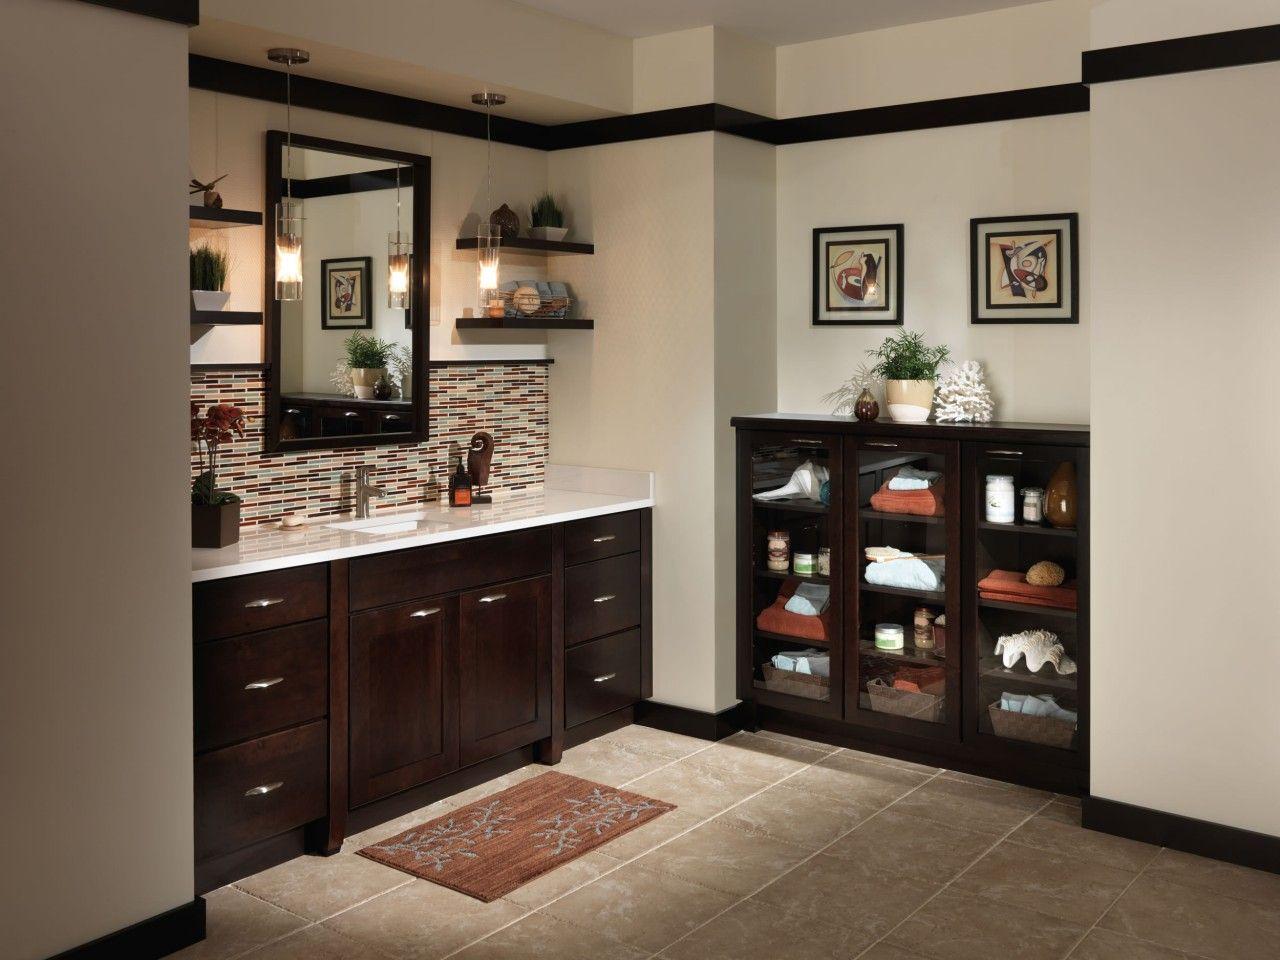 Bathroom Dark Brown Bathroom Sink Cabinets With White Countertops Fabulous Merrilat Cabinets Des Guest Bathroom Design Wood Bathroom Cabinets Bathroom Design